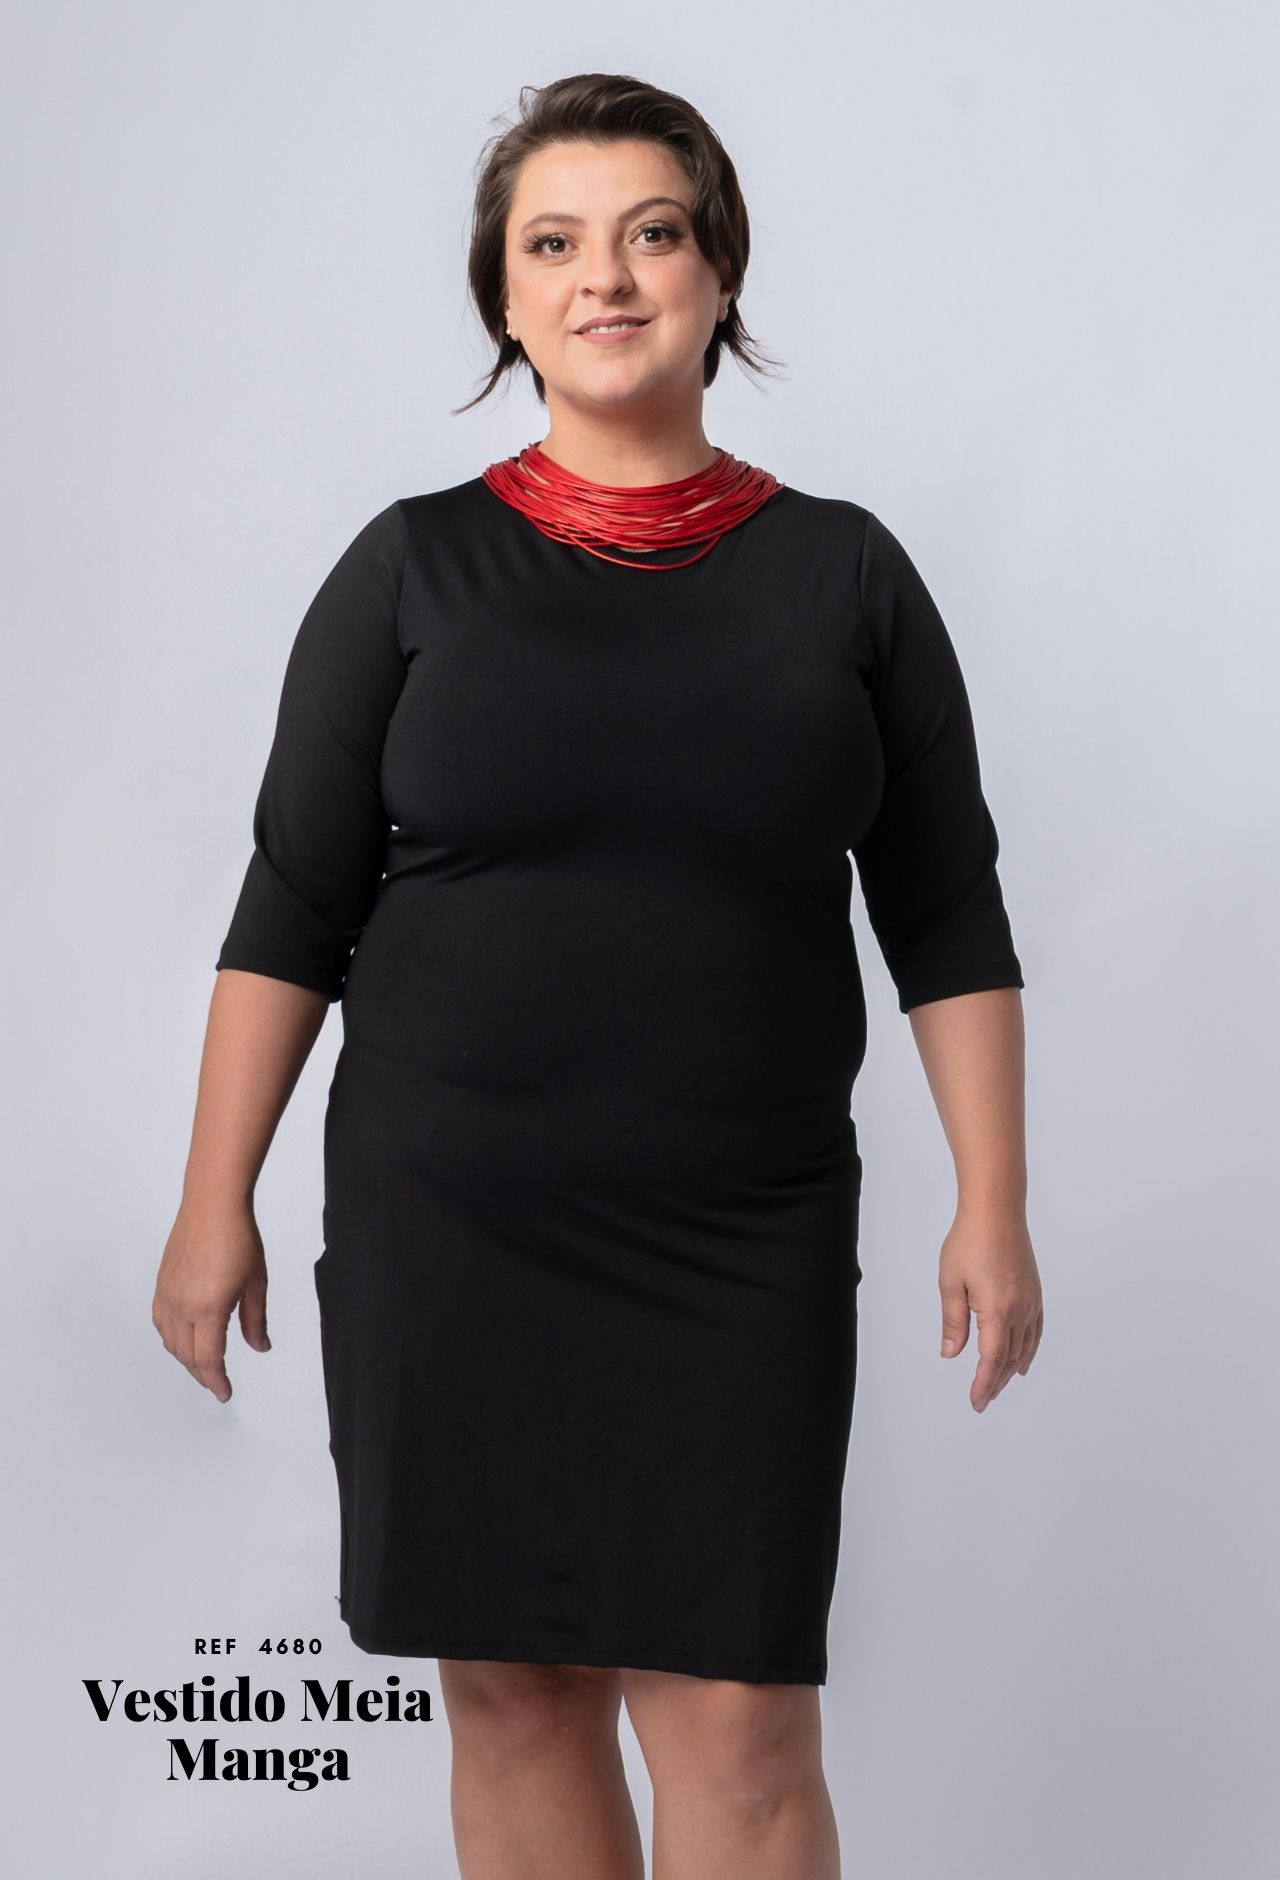 Vestido Meia Manga (4680)